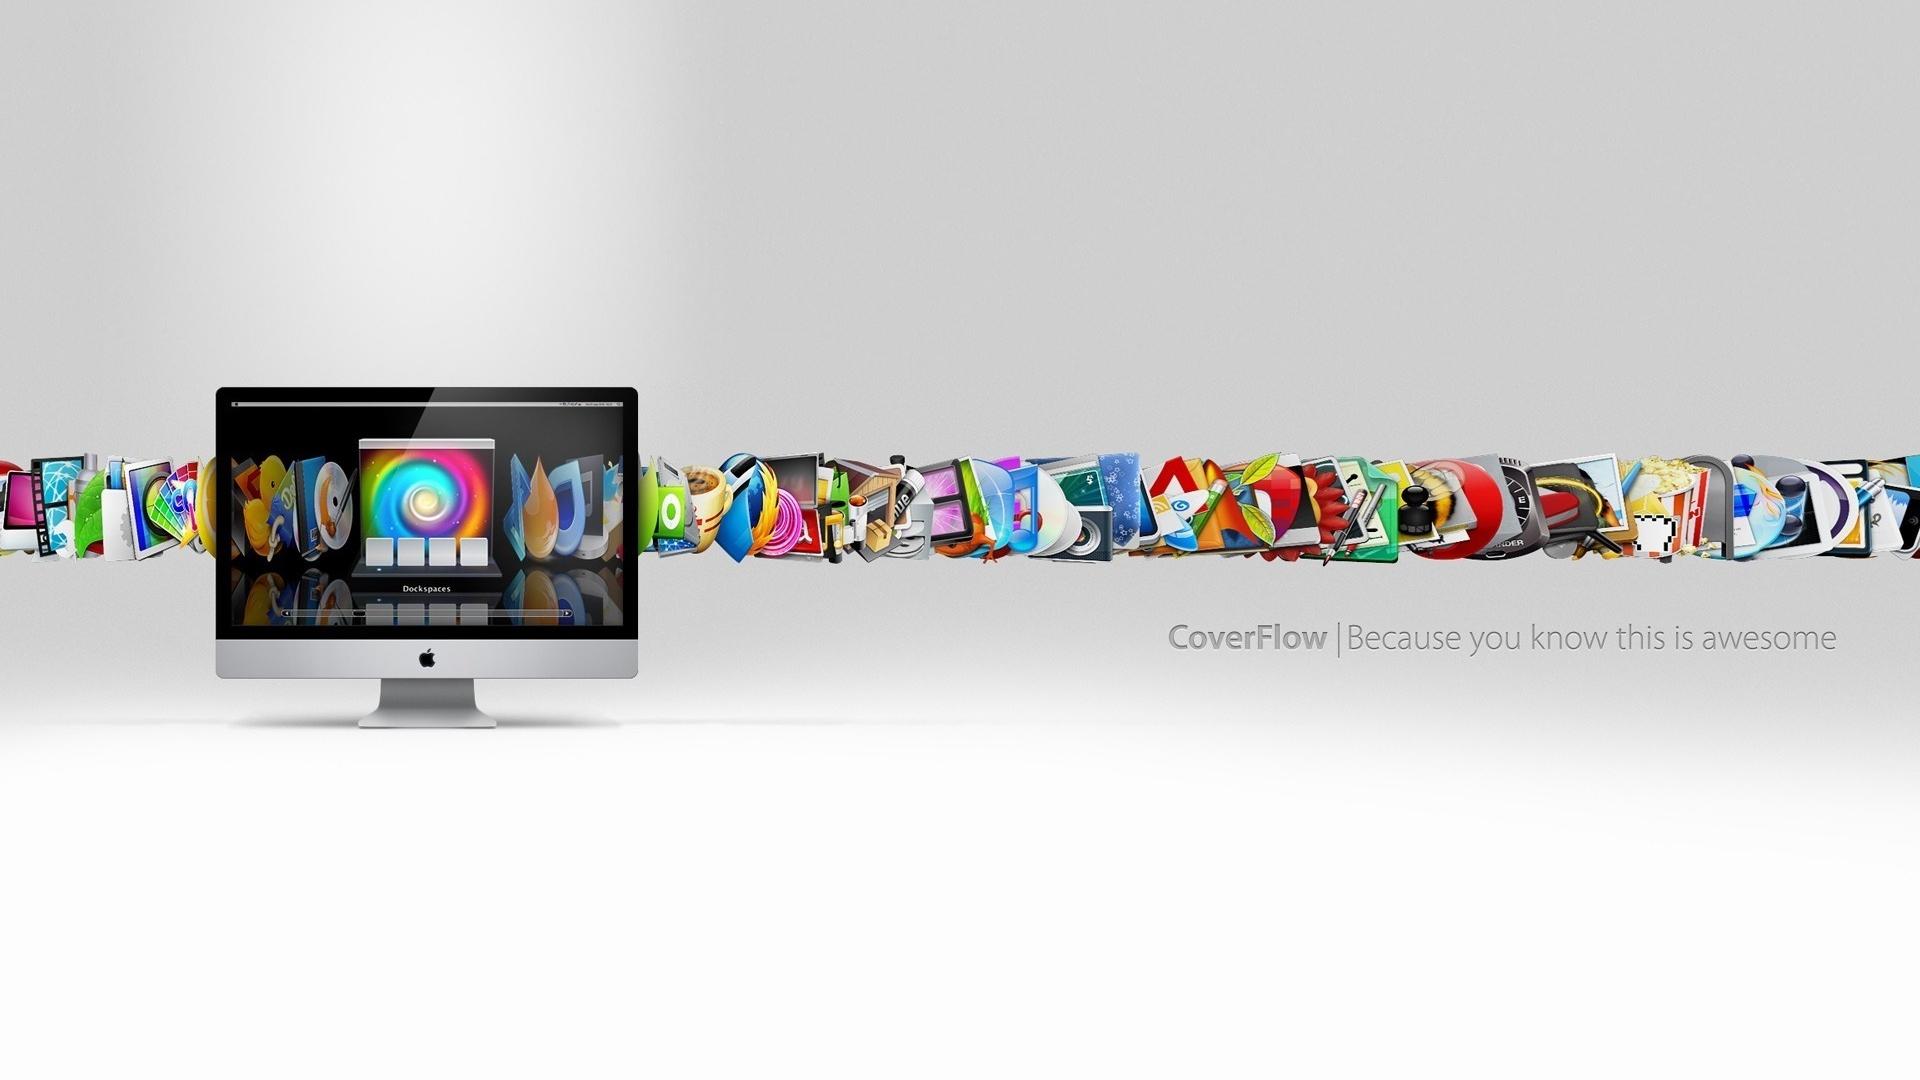 Top Wallpaper Mac 1080p - mac_computer_menu_gray_selection_text_29656_1920x1080  Picture_799660.jpg